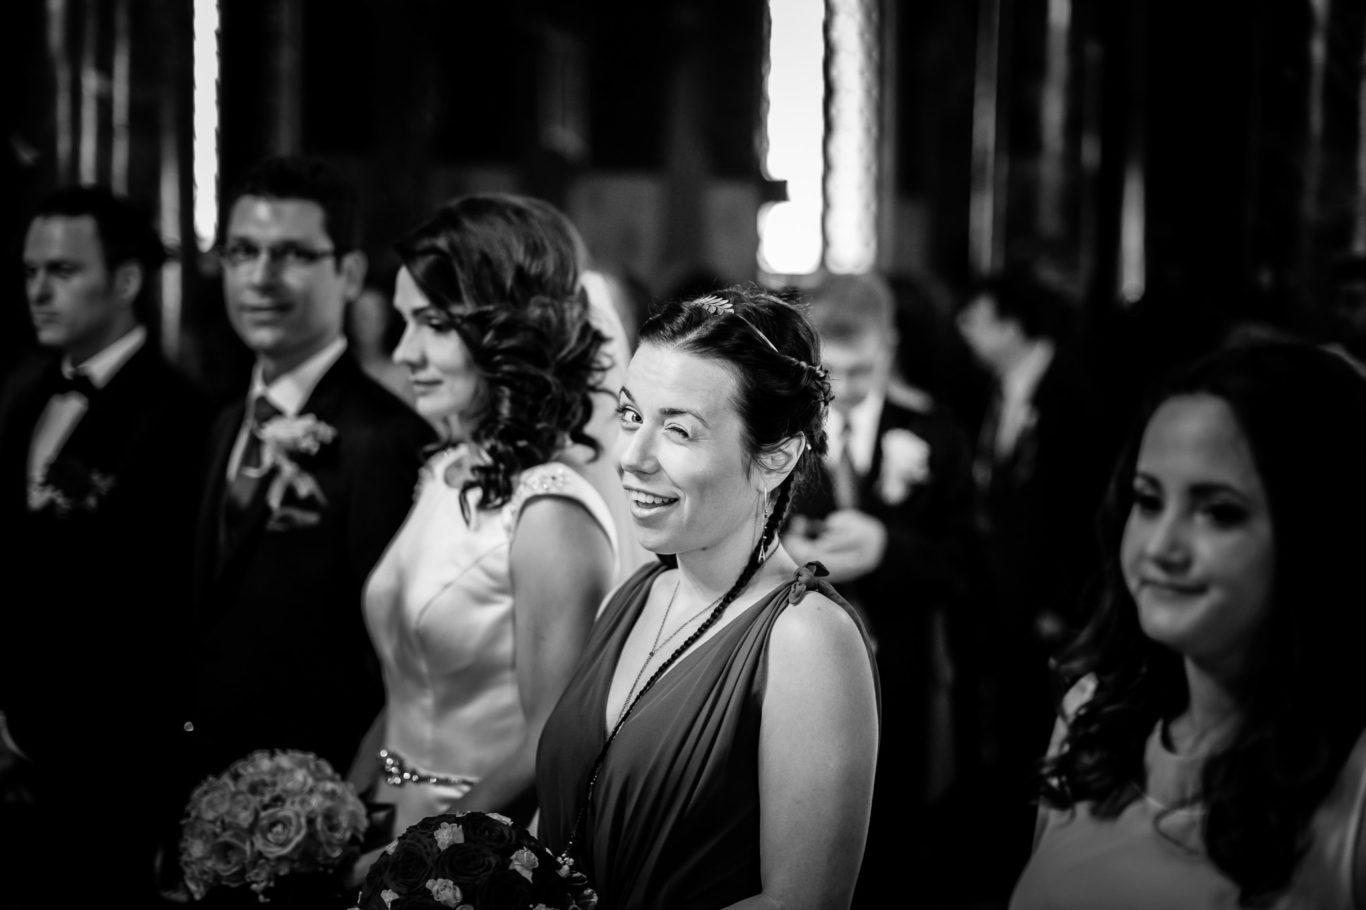 0400-fotografie-nunta-bucuresti-dana-radu-fotograf-ciprian-dumitrescu-cd2_7270